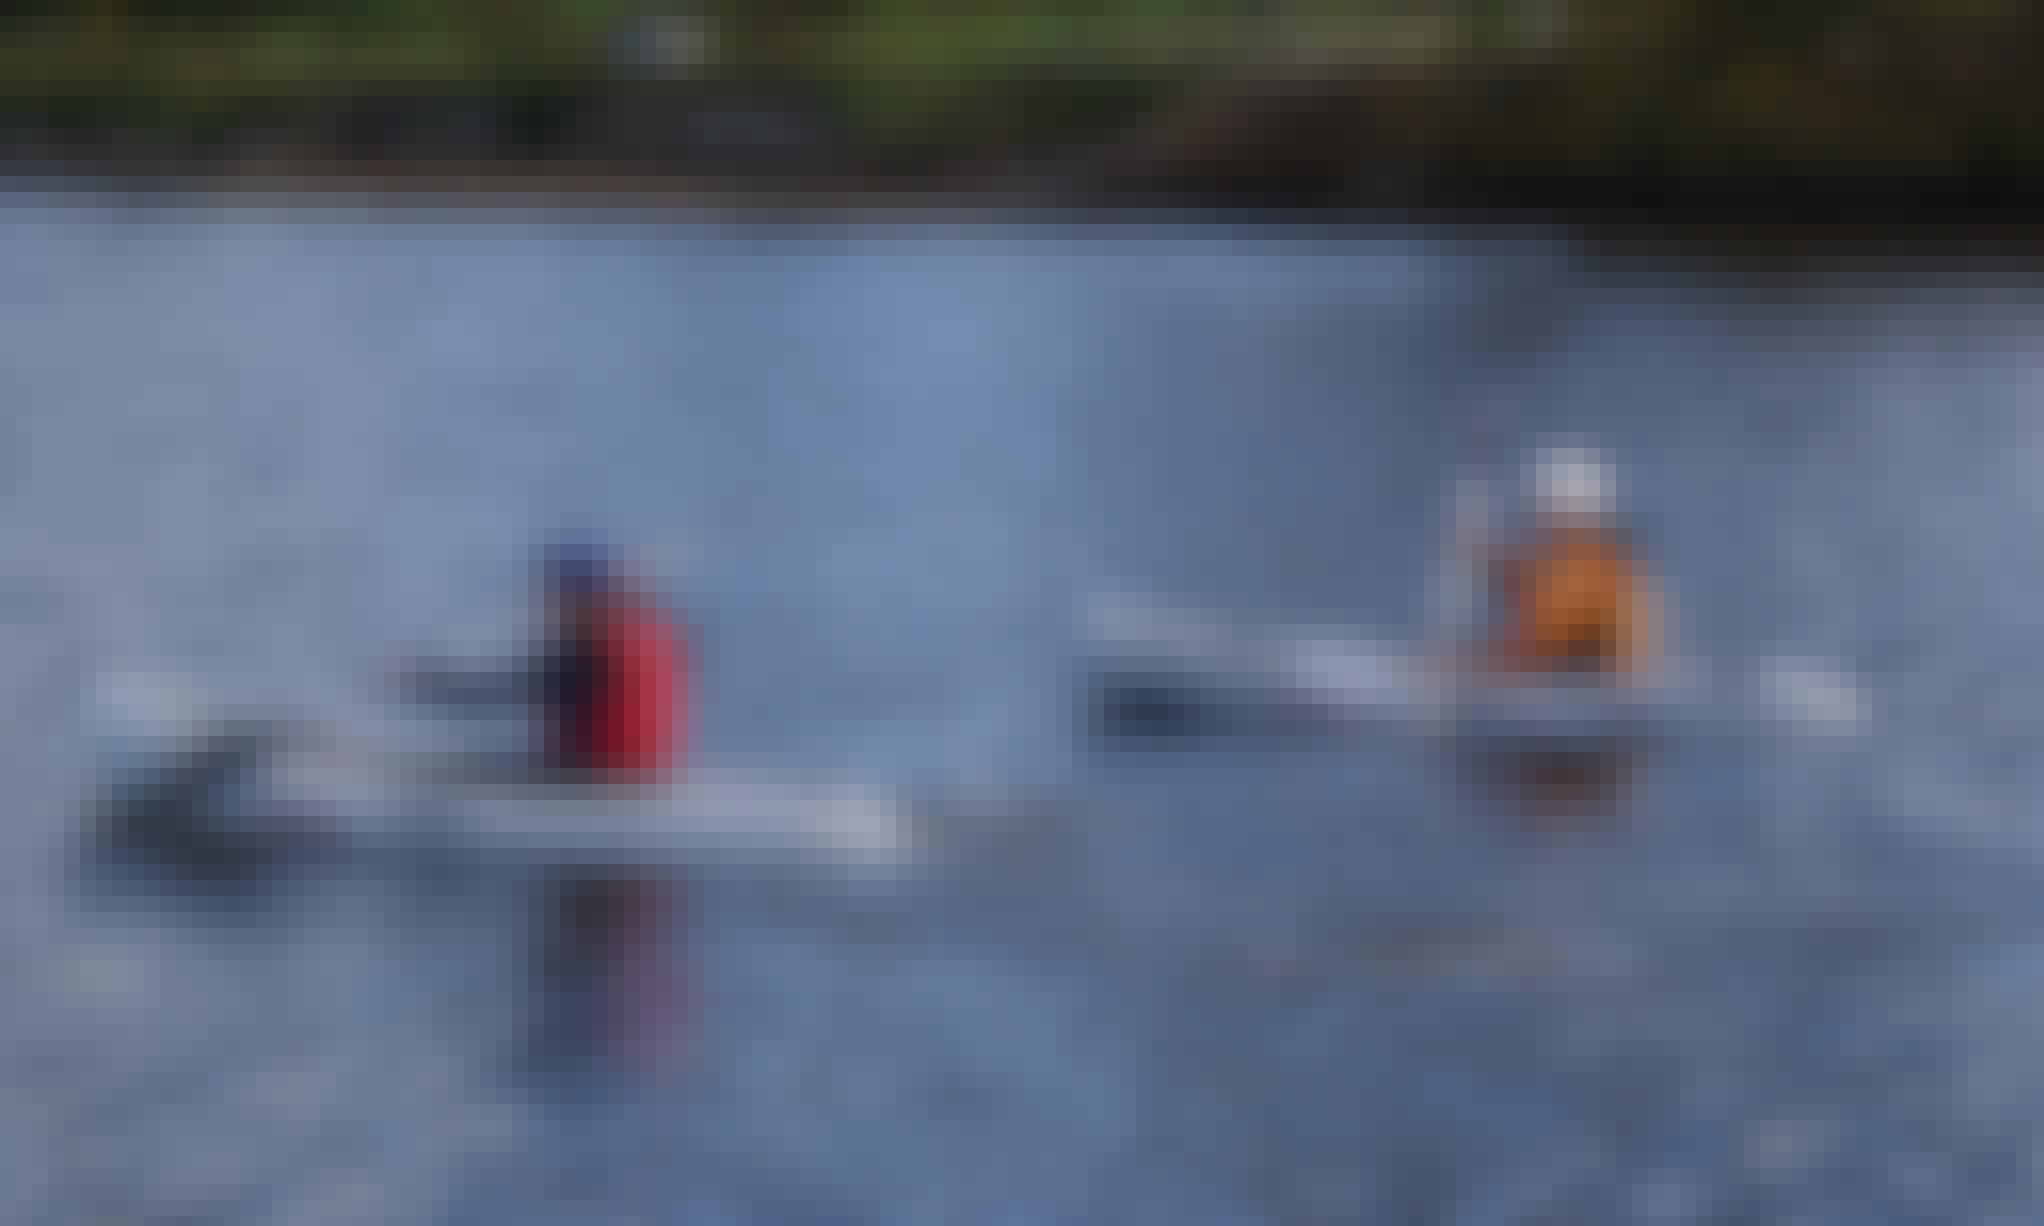 Rent a Single Kayak on Kenmare Bay, Ireland